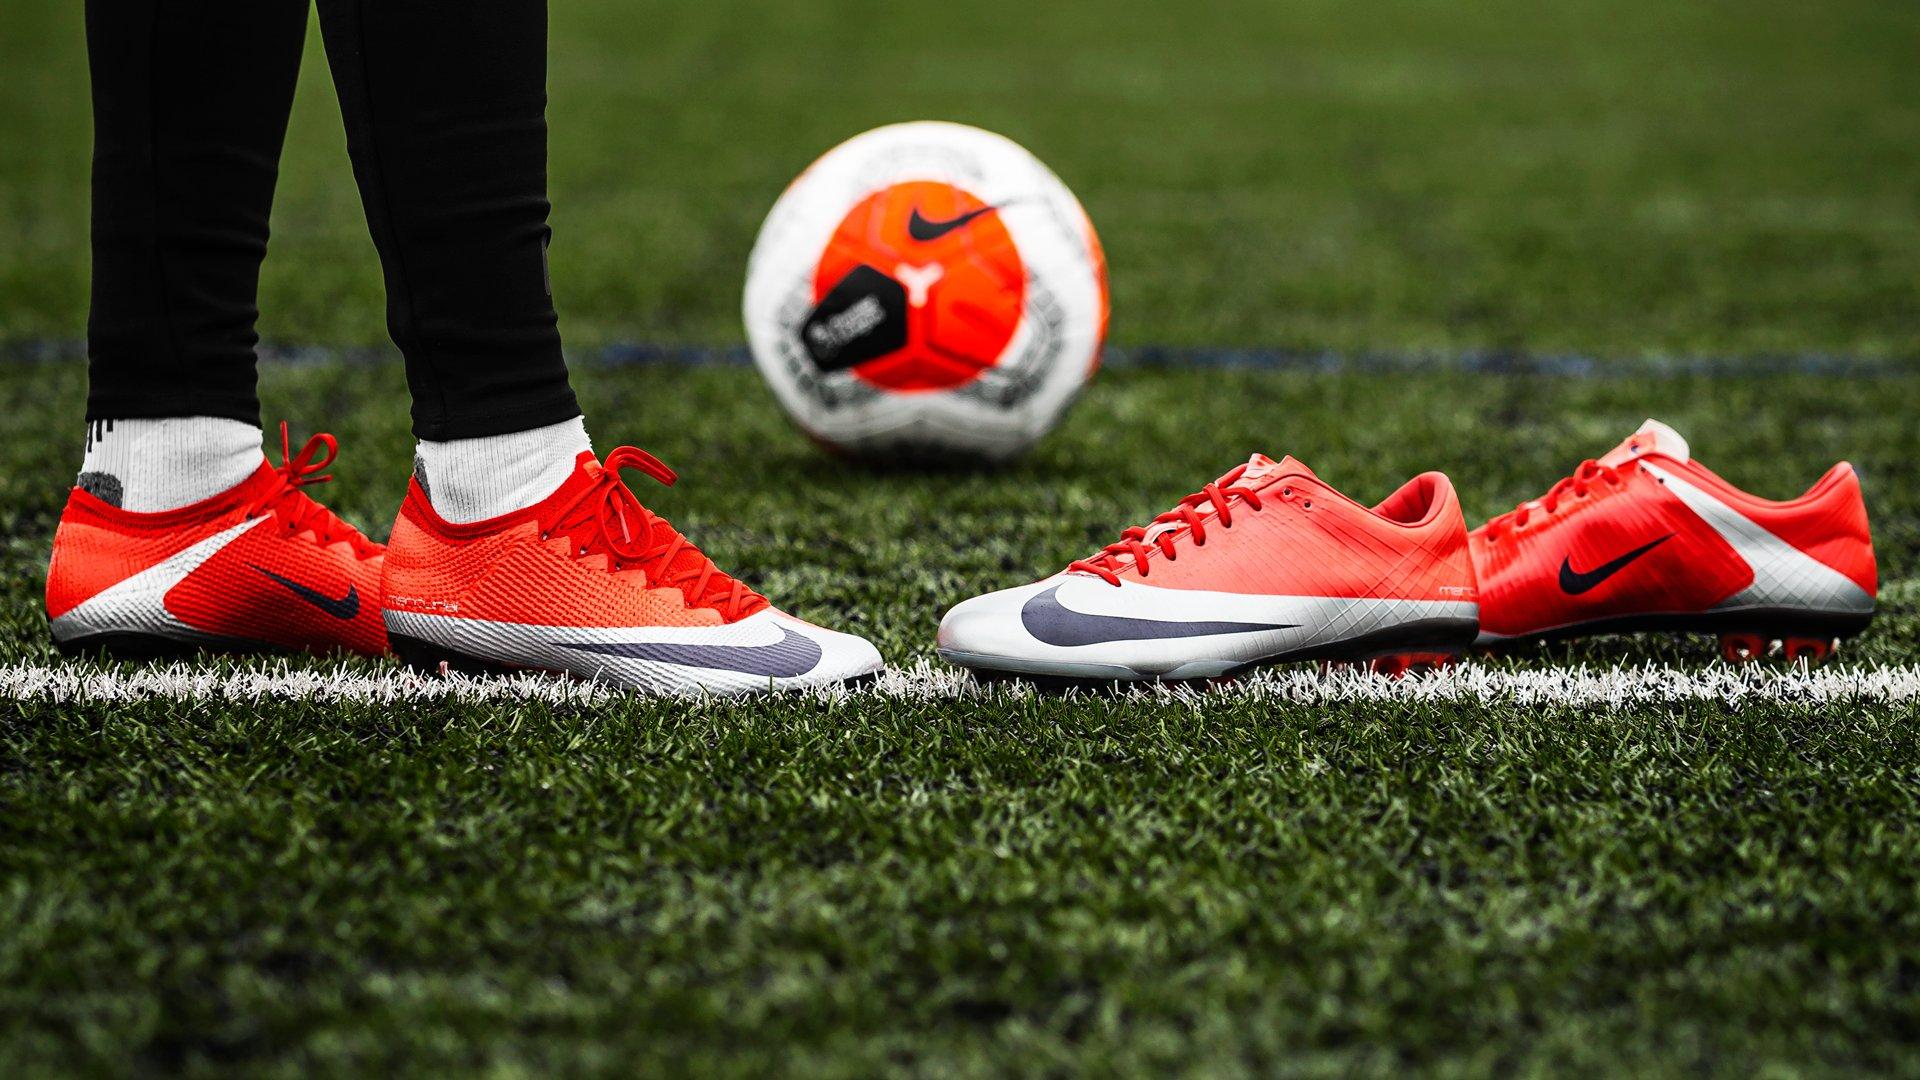 Síntomas Sabio lucha  Nike Mercurial Vapor 13 Future DNA   Get all the details at Unisport